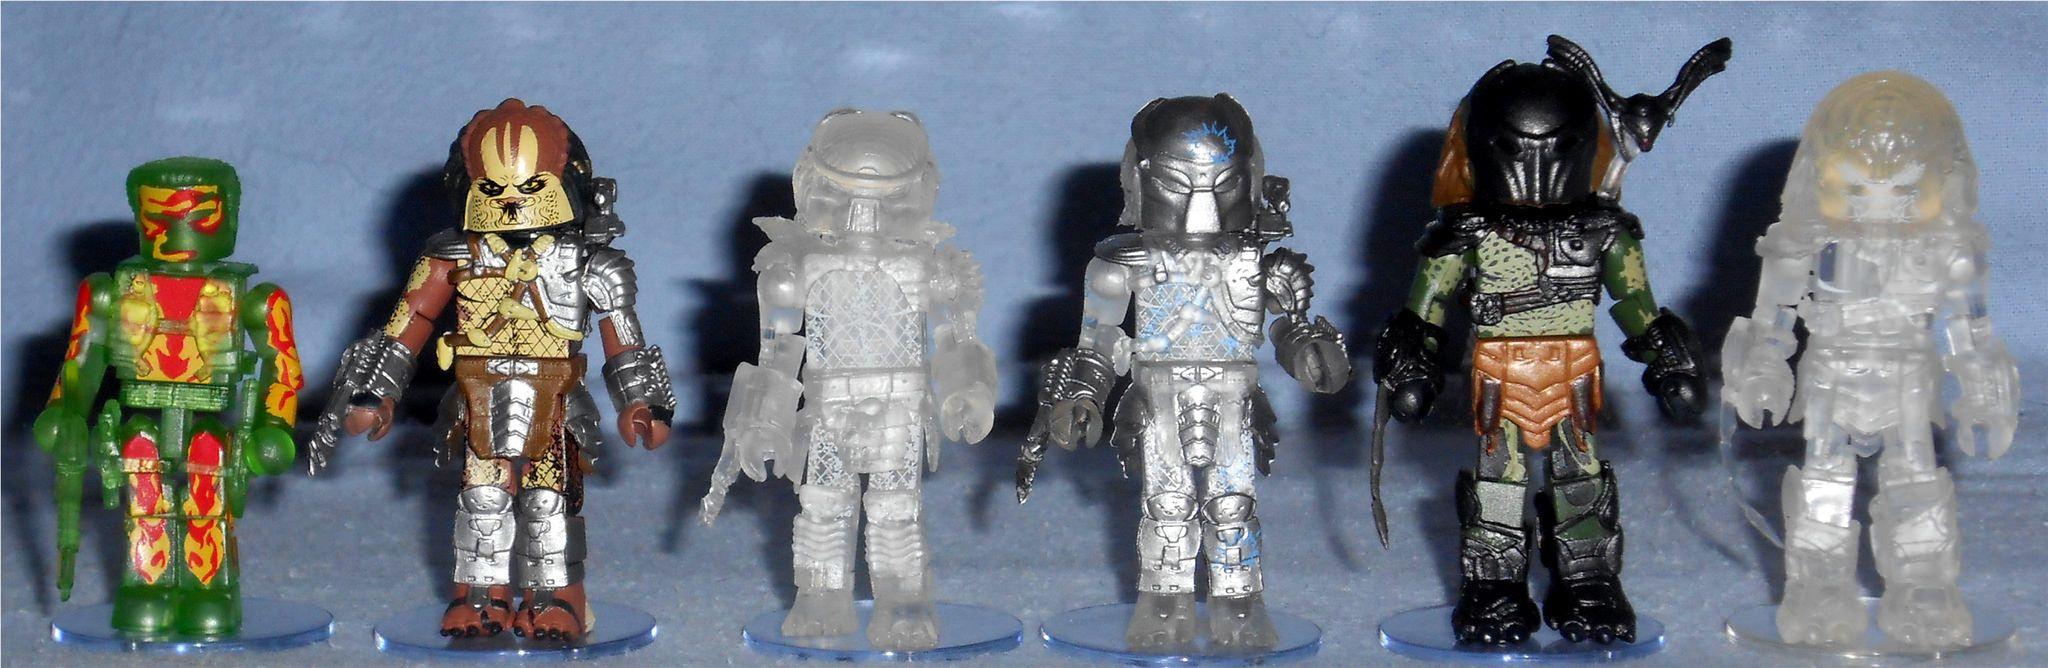 Predator Minimates Series 3 Thermal Dutch